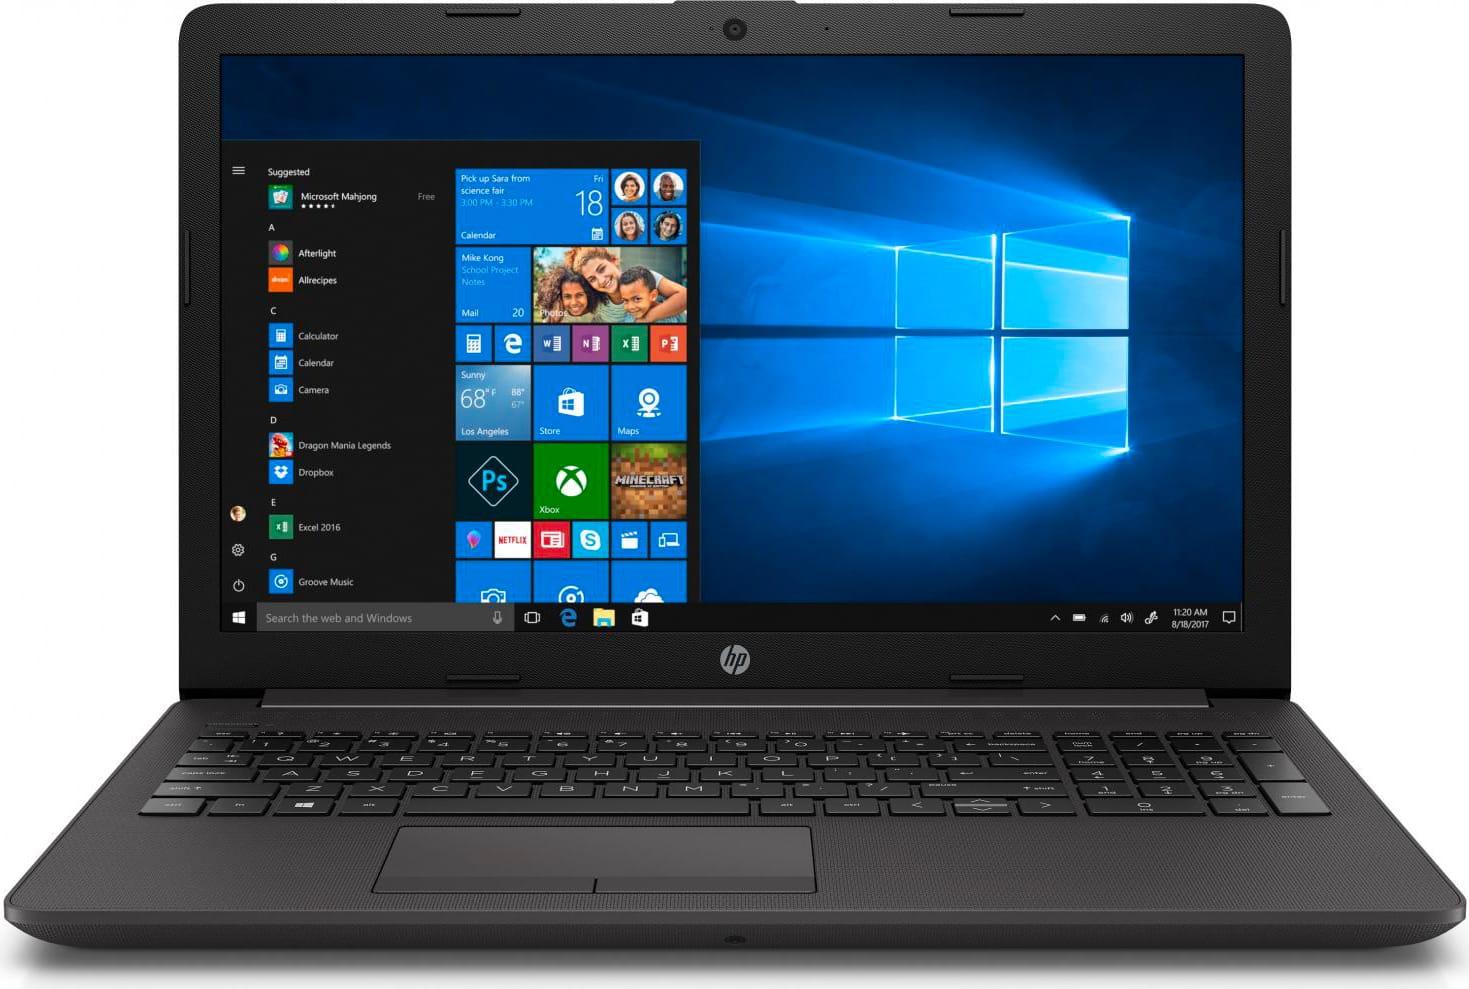 HP 6bp89ea 250 G7 Notebook N4000 Intel Celeron Hdd 500 Gb Ram 4gb 15.6 Pollici Computer Portatile Windows 10 - 6bp89ea